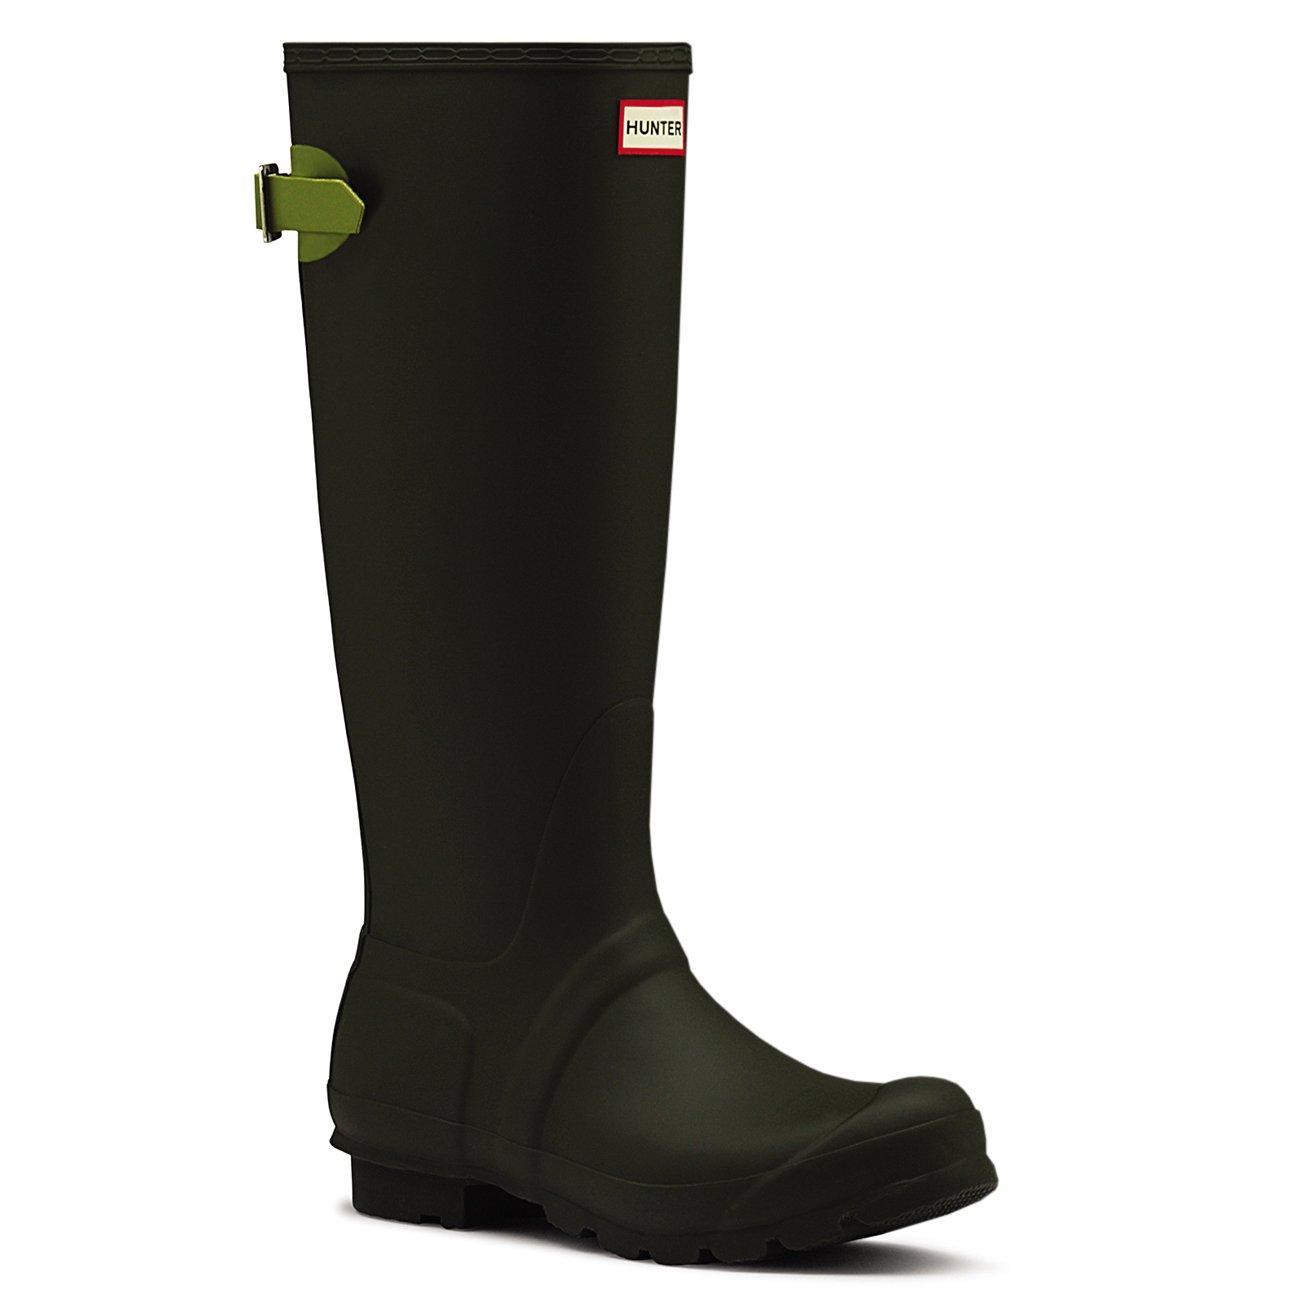 Hunter Womens Adjustable Back Wellingtons Waterproof Rubber Rain Boots - Dark Olive/Kelp - 6